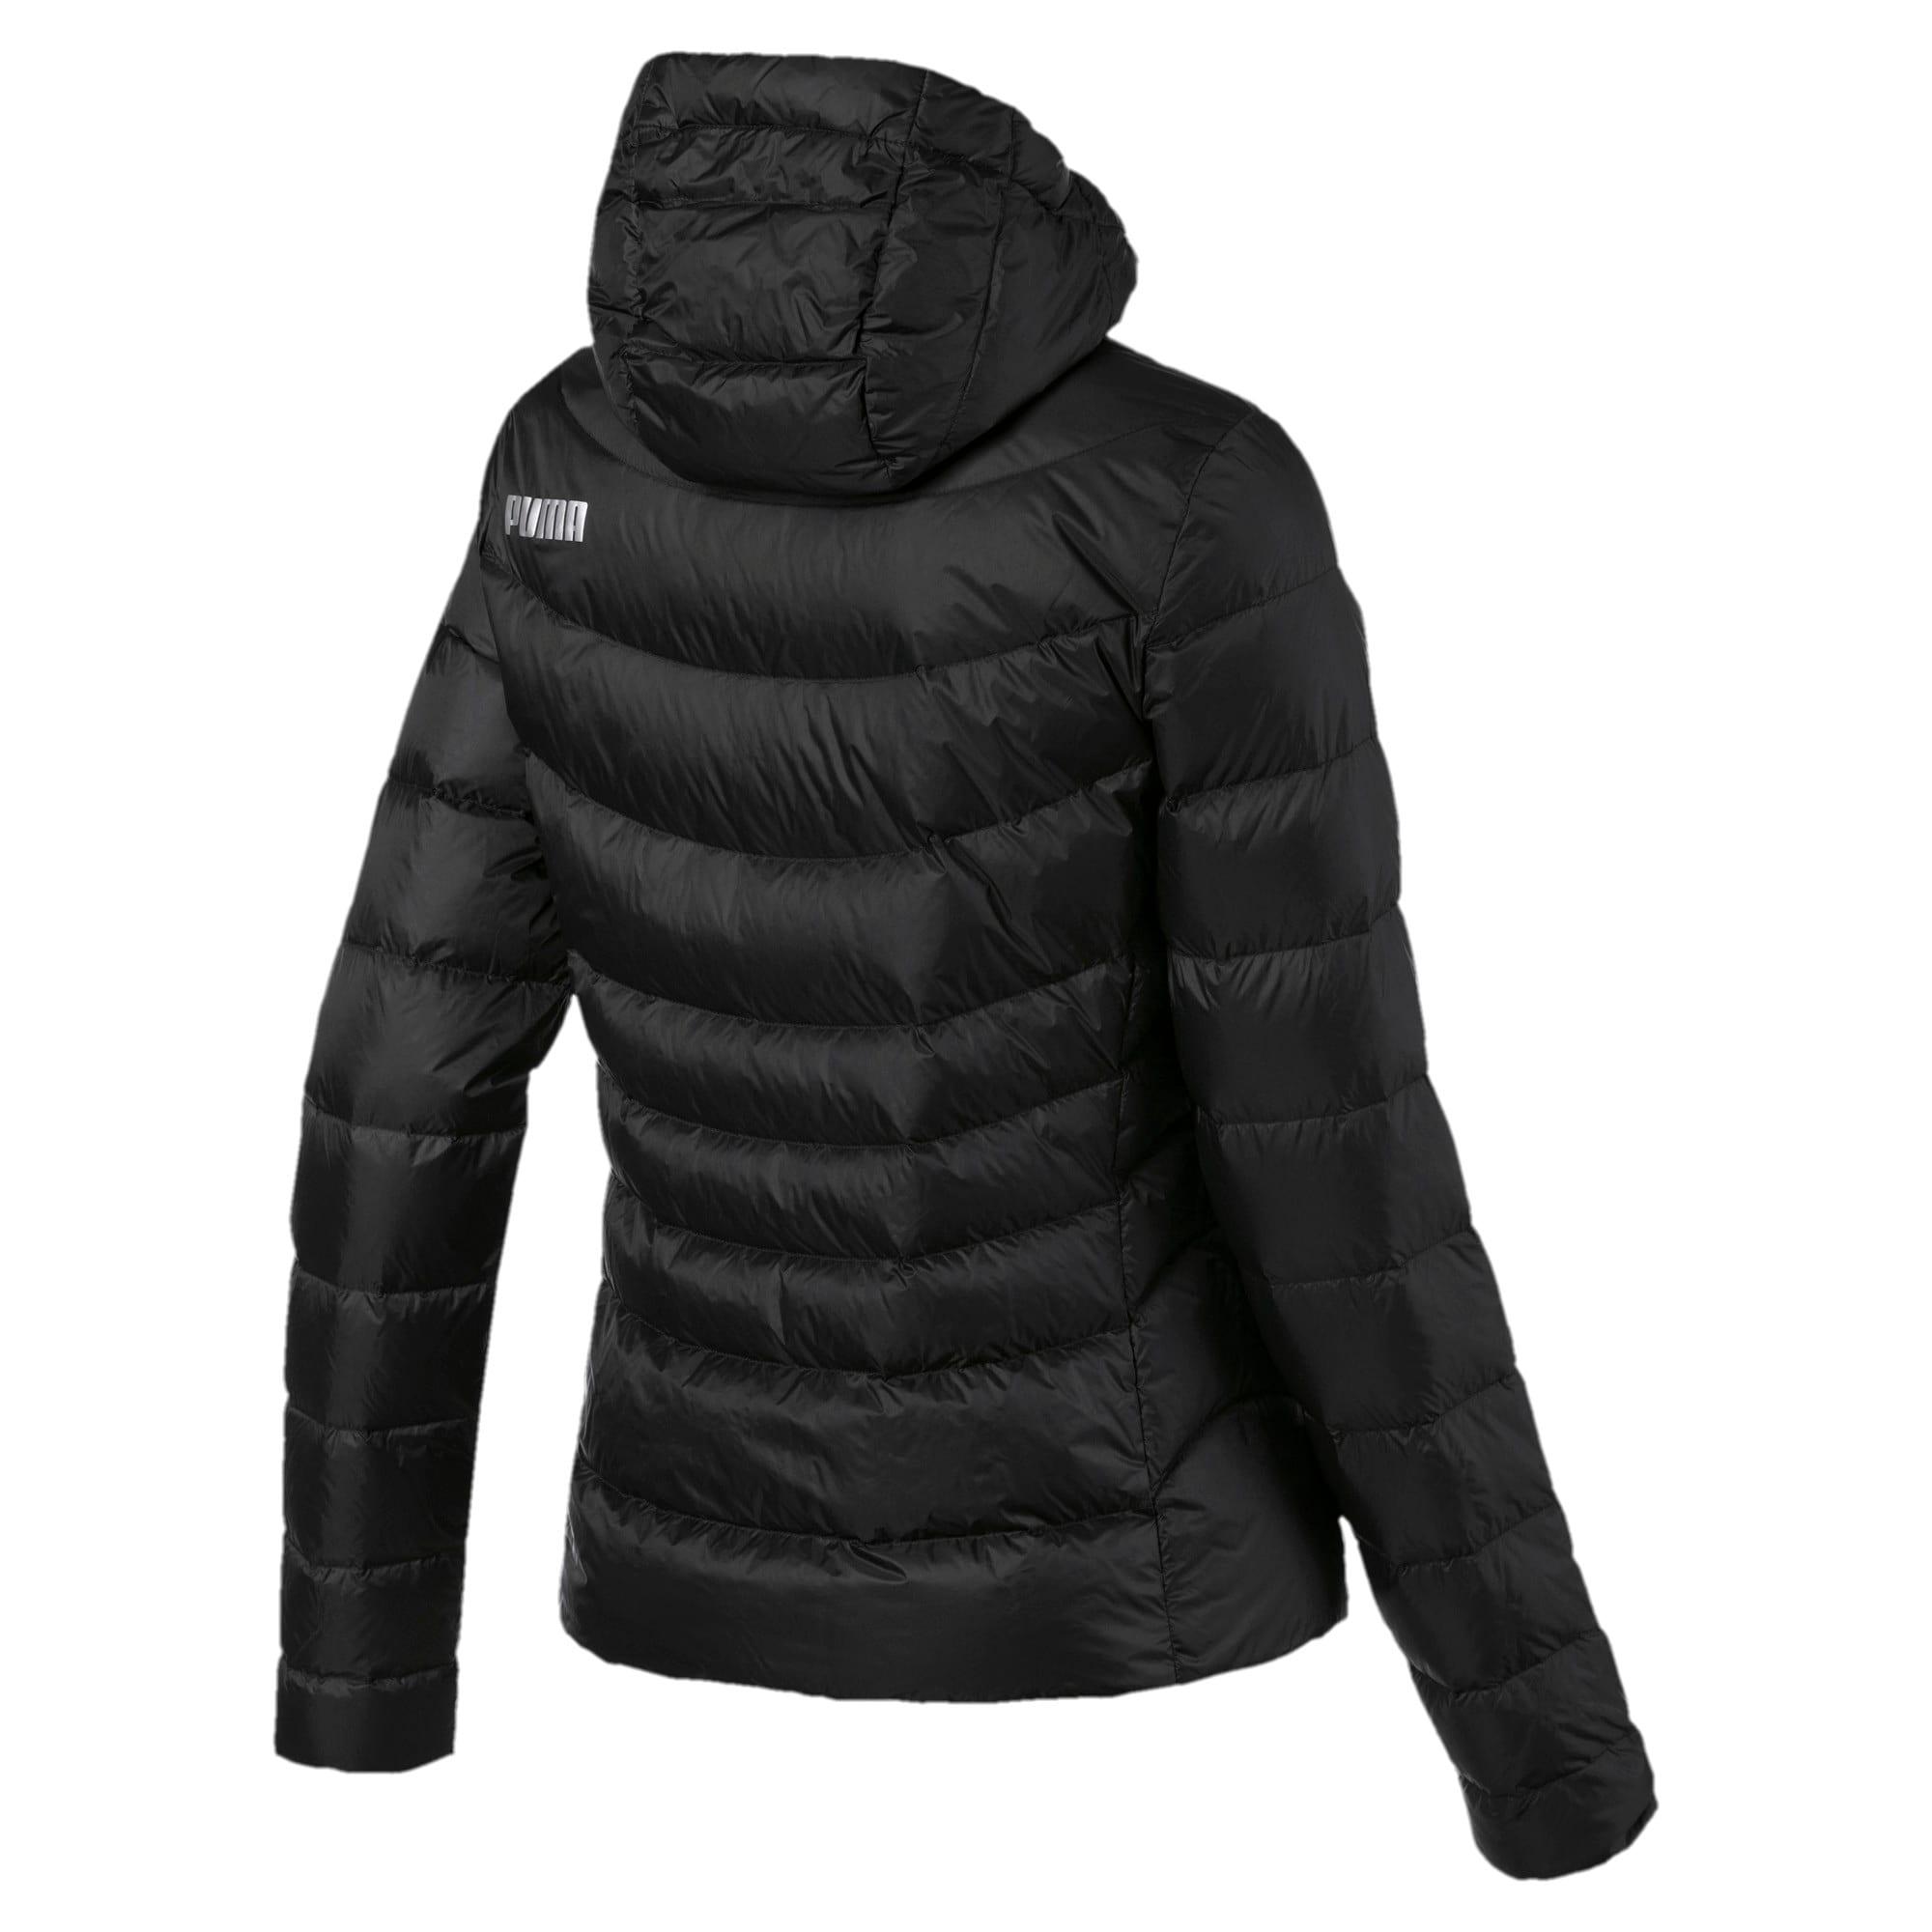 Thumbnail 5 of PWRWarm packLITE Down Women's Jacket, Puma Black, medium